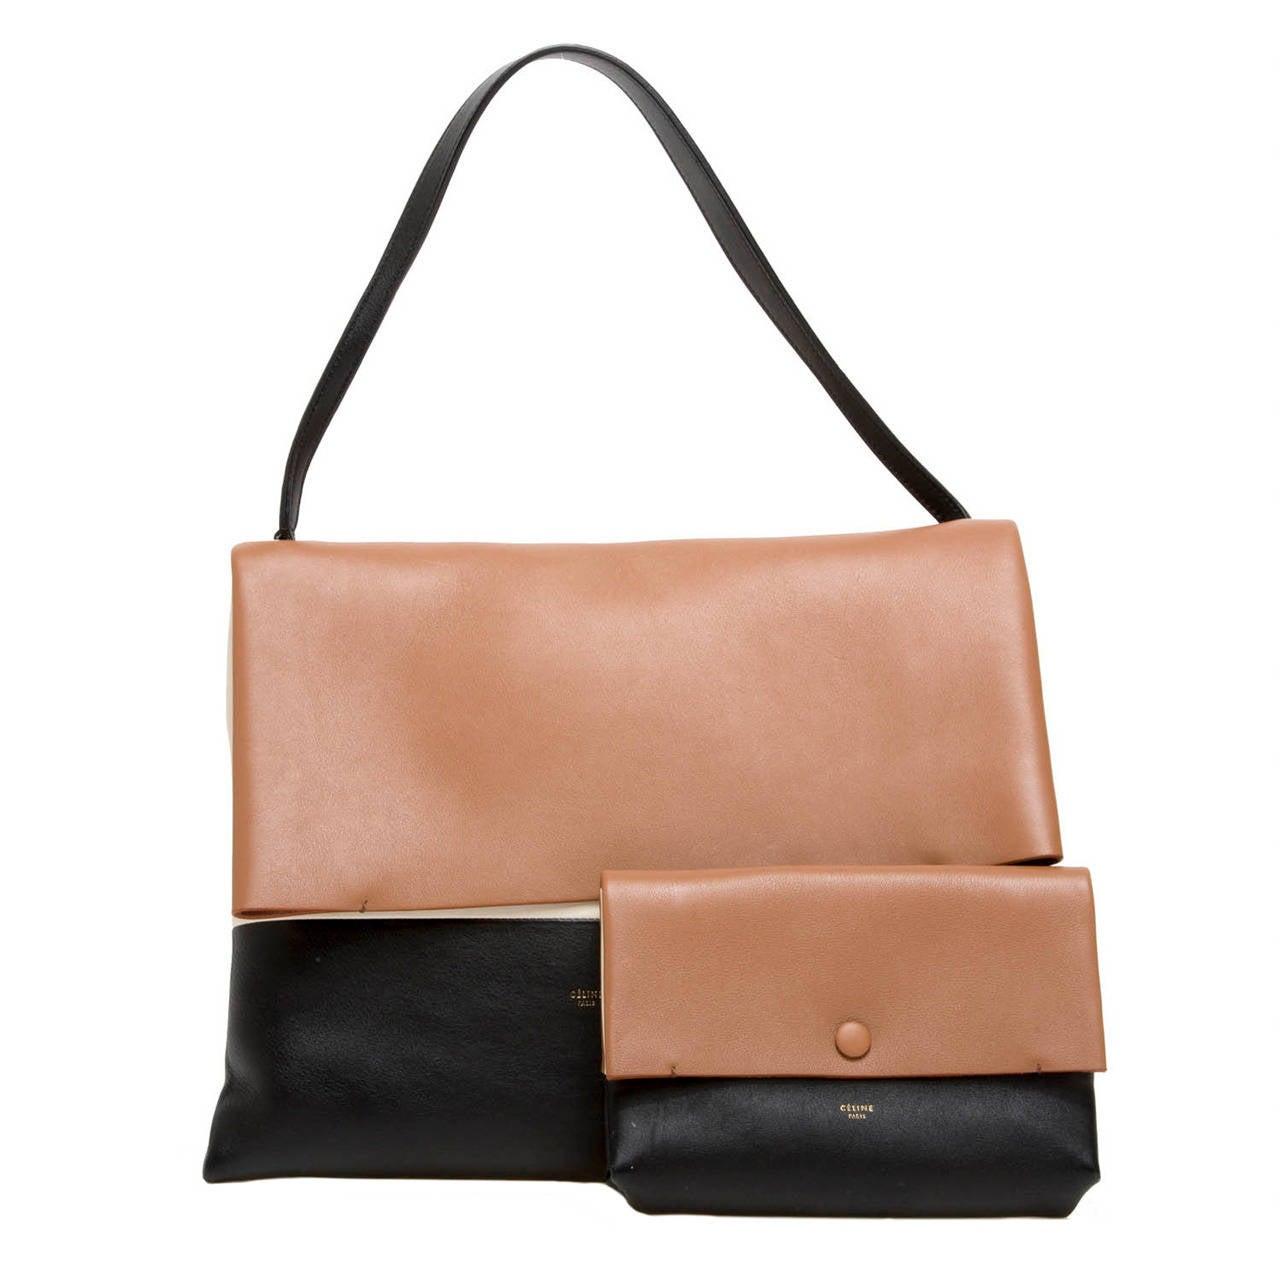 yellow celine bag - celine all soft tri-color tote, celine leather handbags